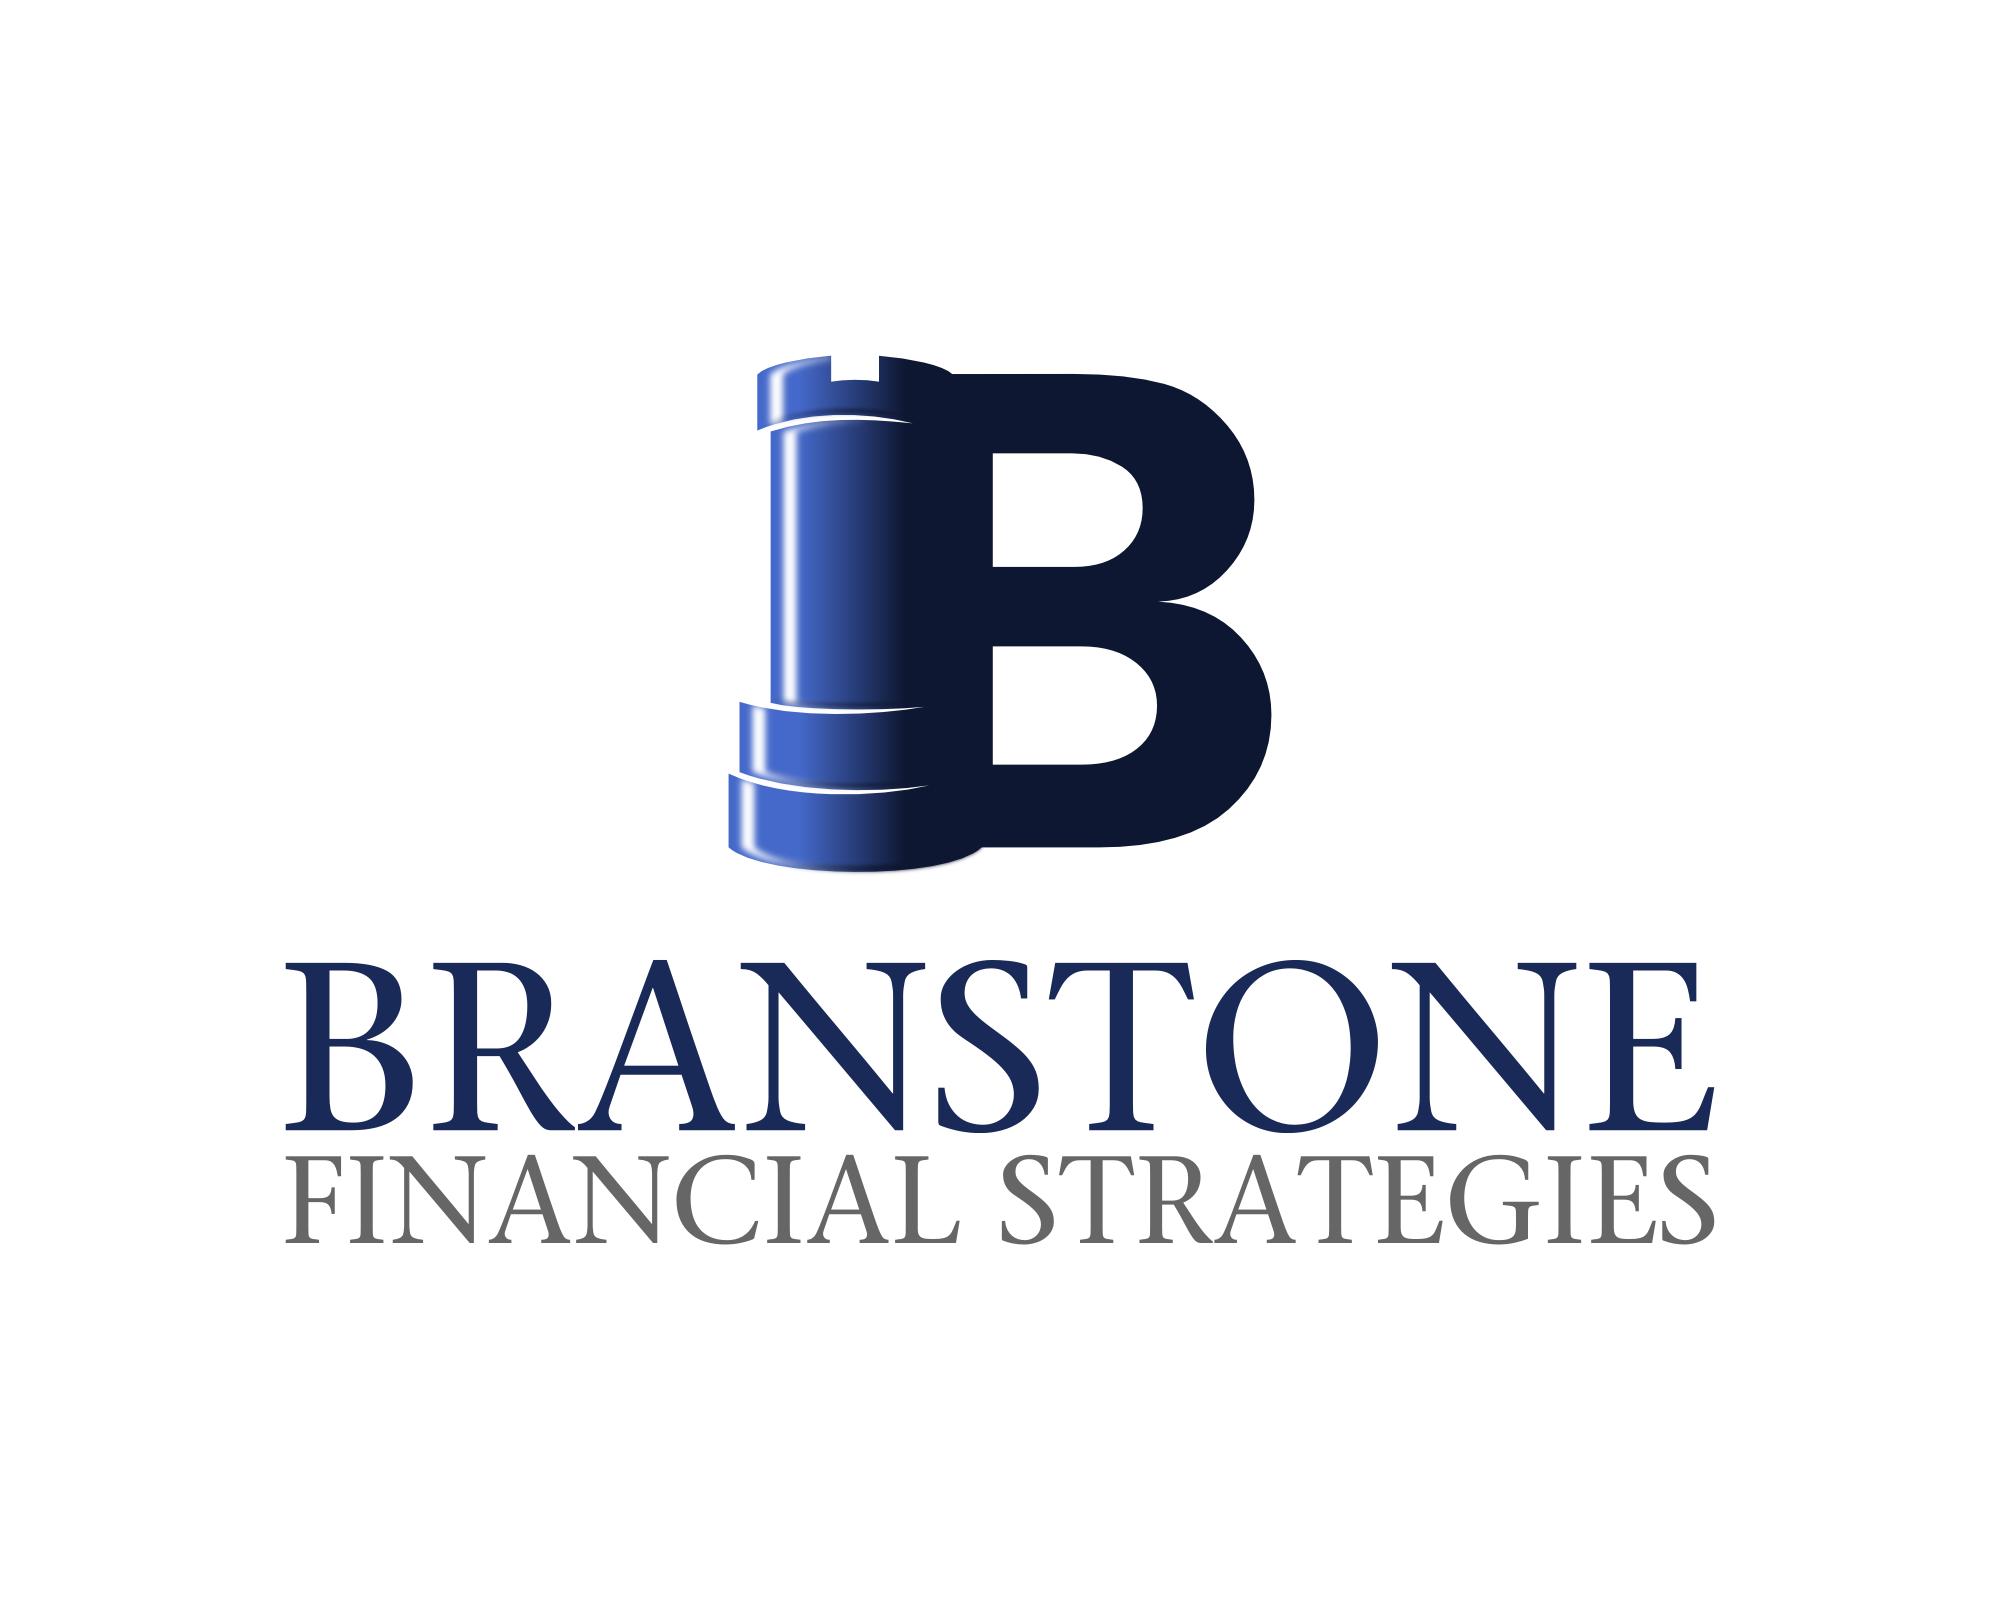 Logo Design by explogos - Entry No. 355 in the Logo Design Contest Inspiring Logo Design for Branstone Financial Strategies.